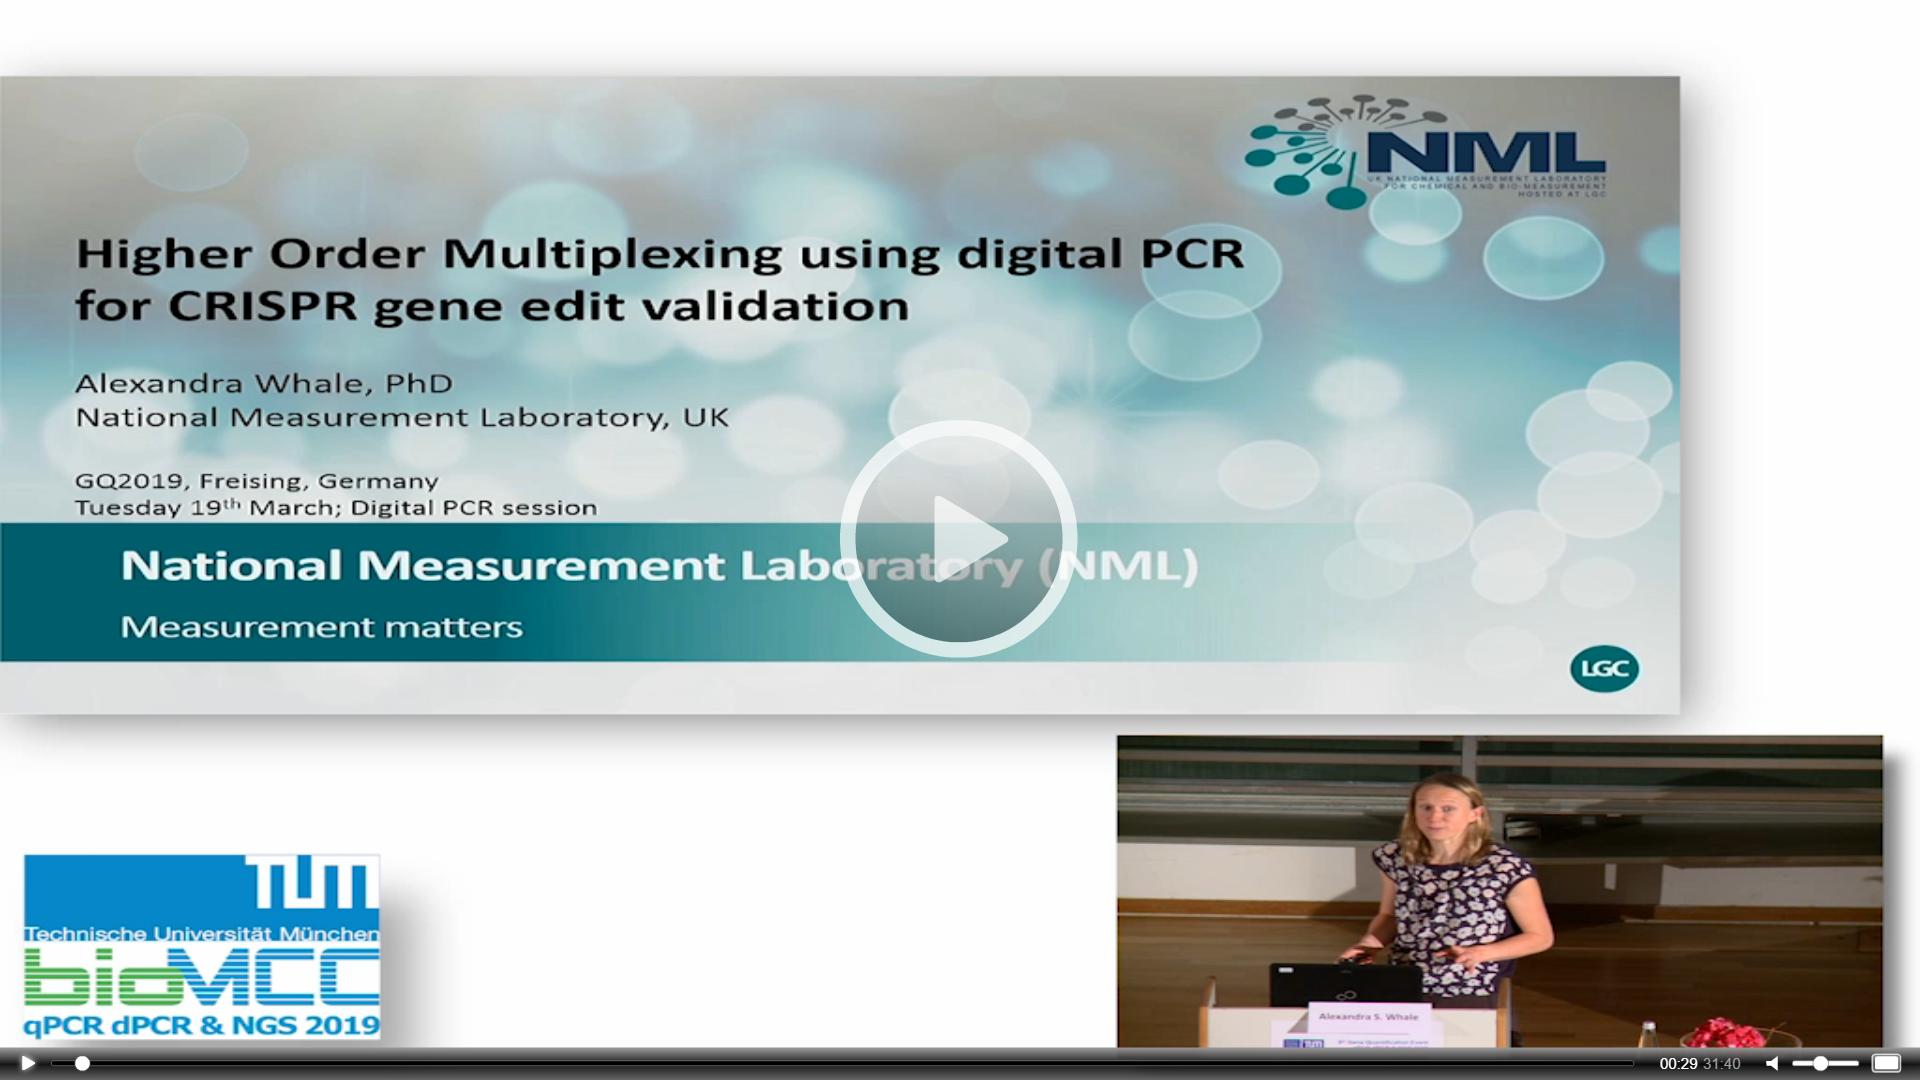 Higher Order Multiplexing Using Digital PCR for CRISPR Gene Edit Validation